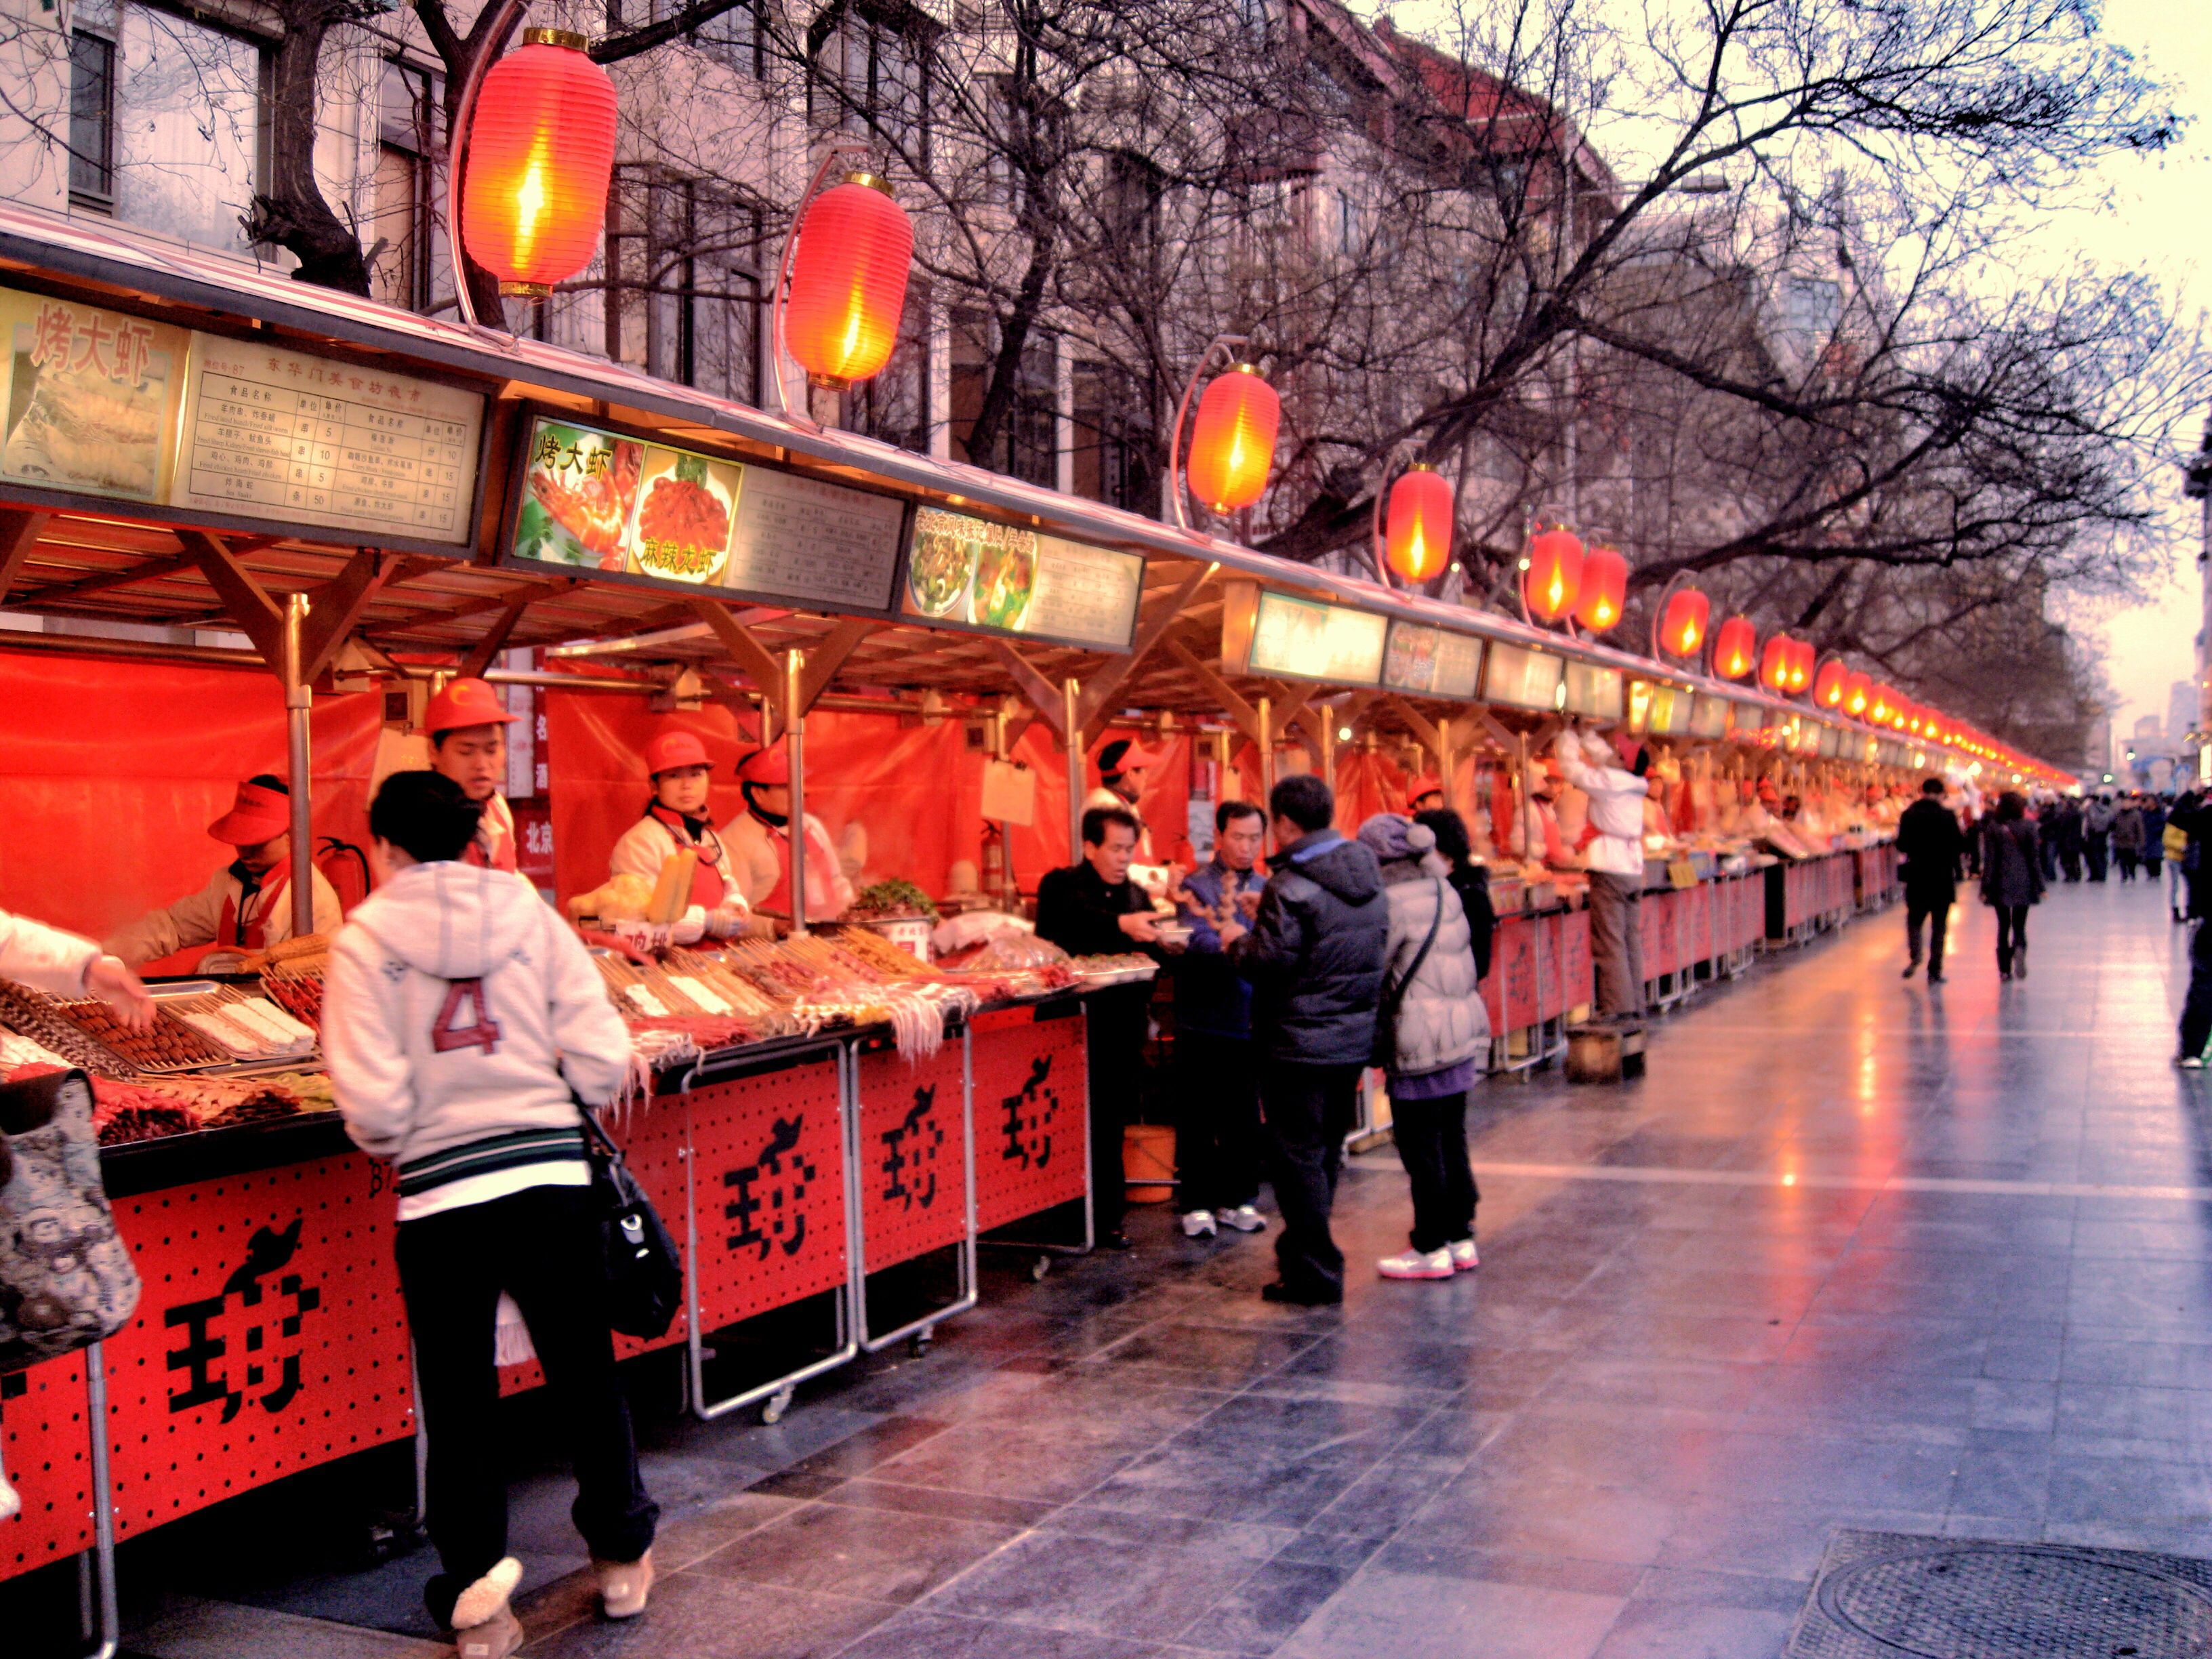 Картинки по запросу travel beijing site:pinterest.com